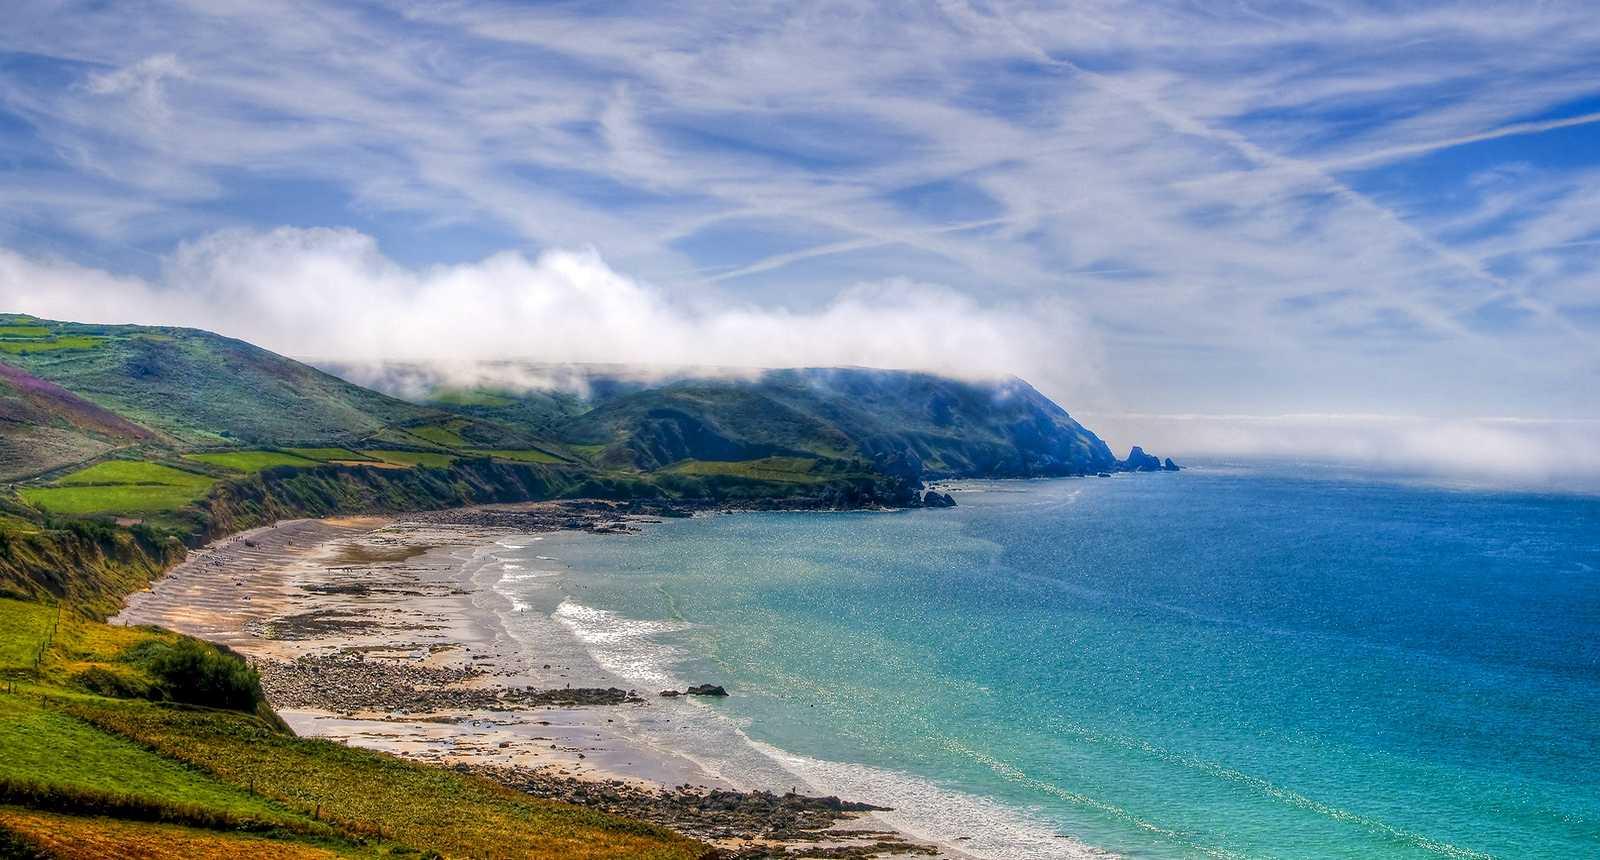 Panorama sur la Baie d'Ecalgrain